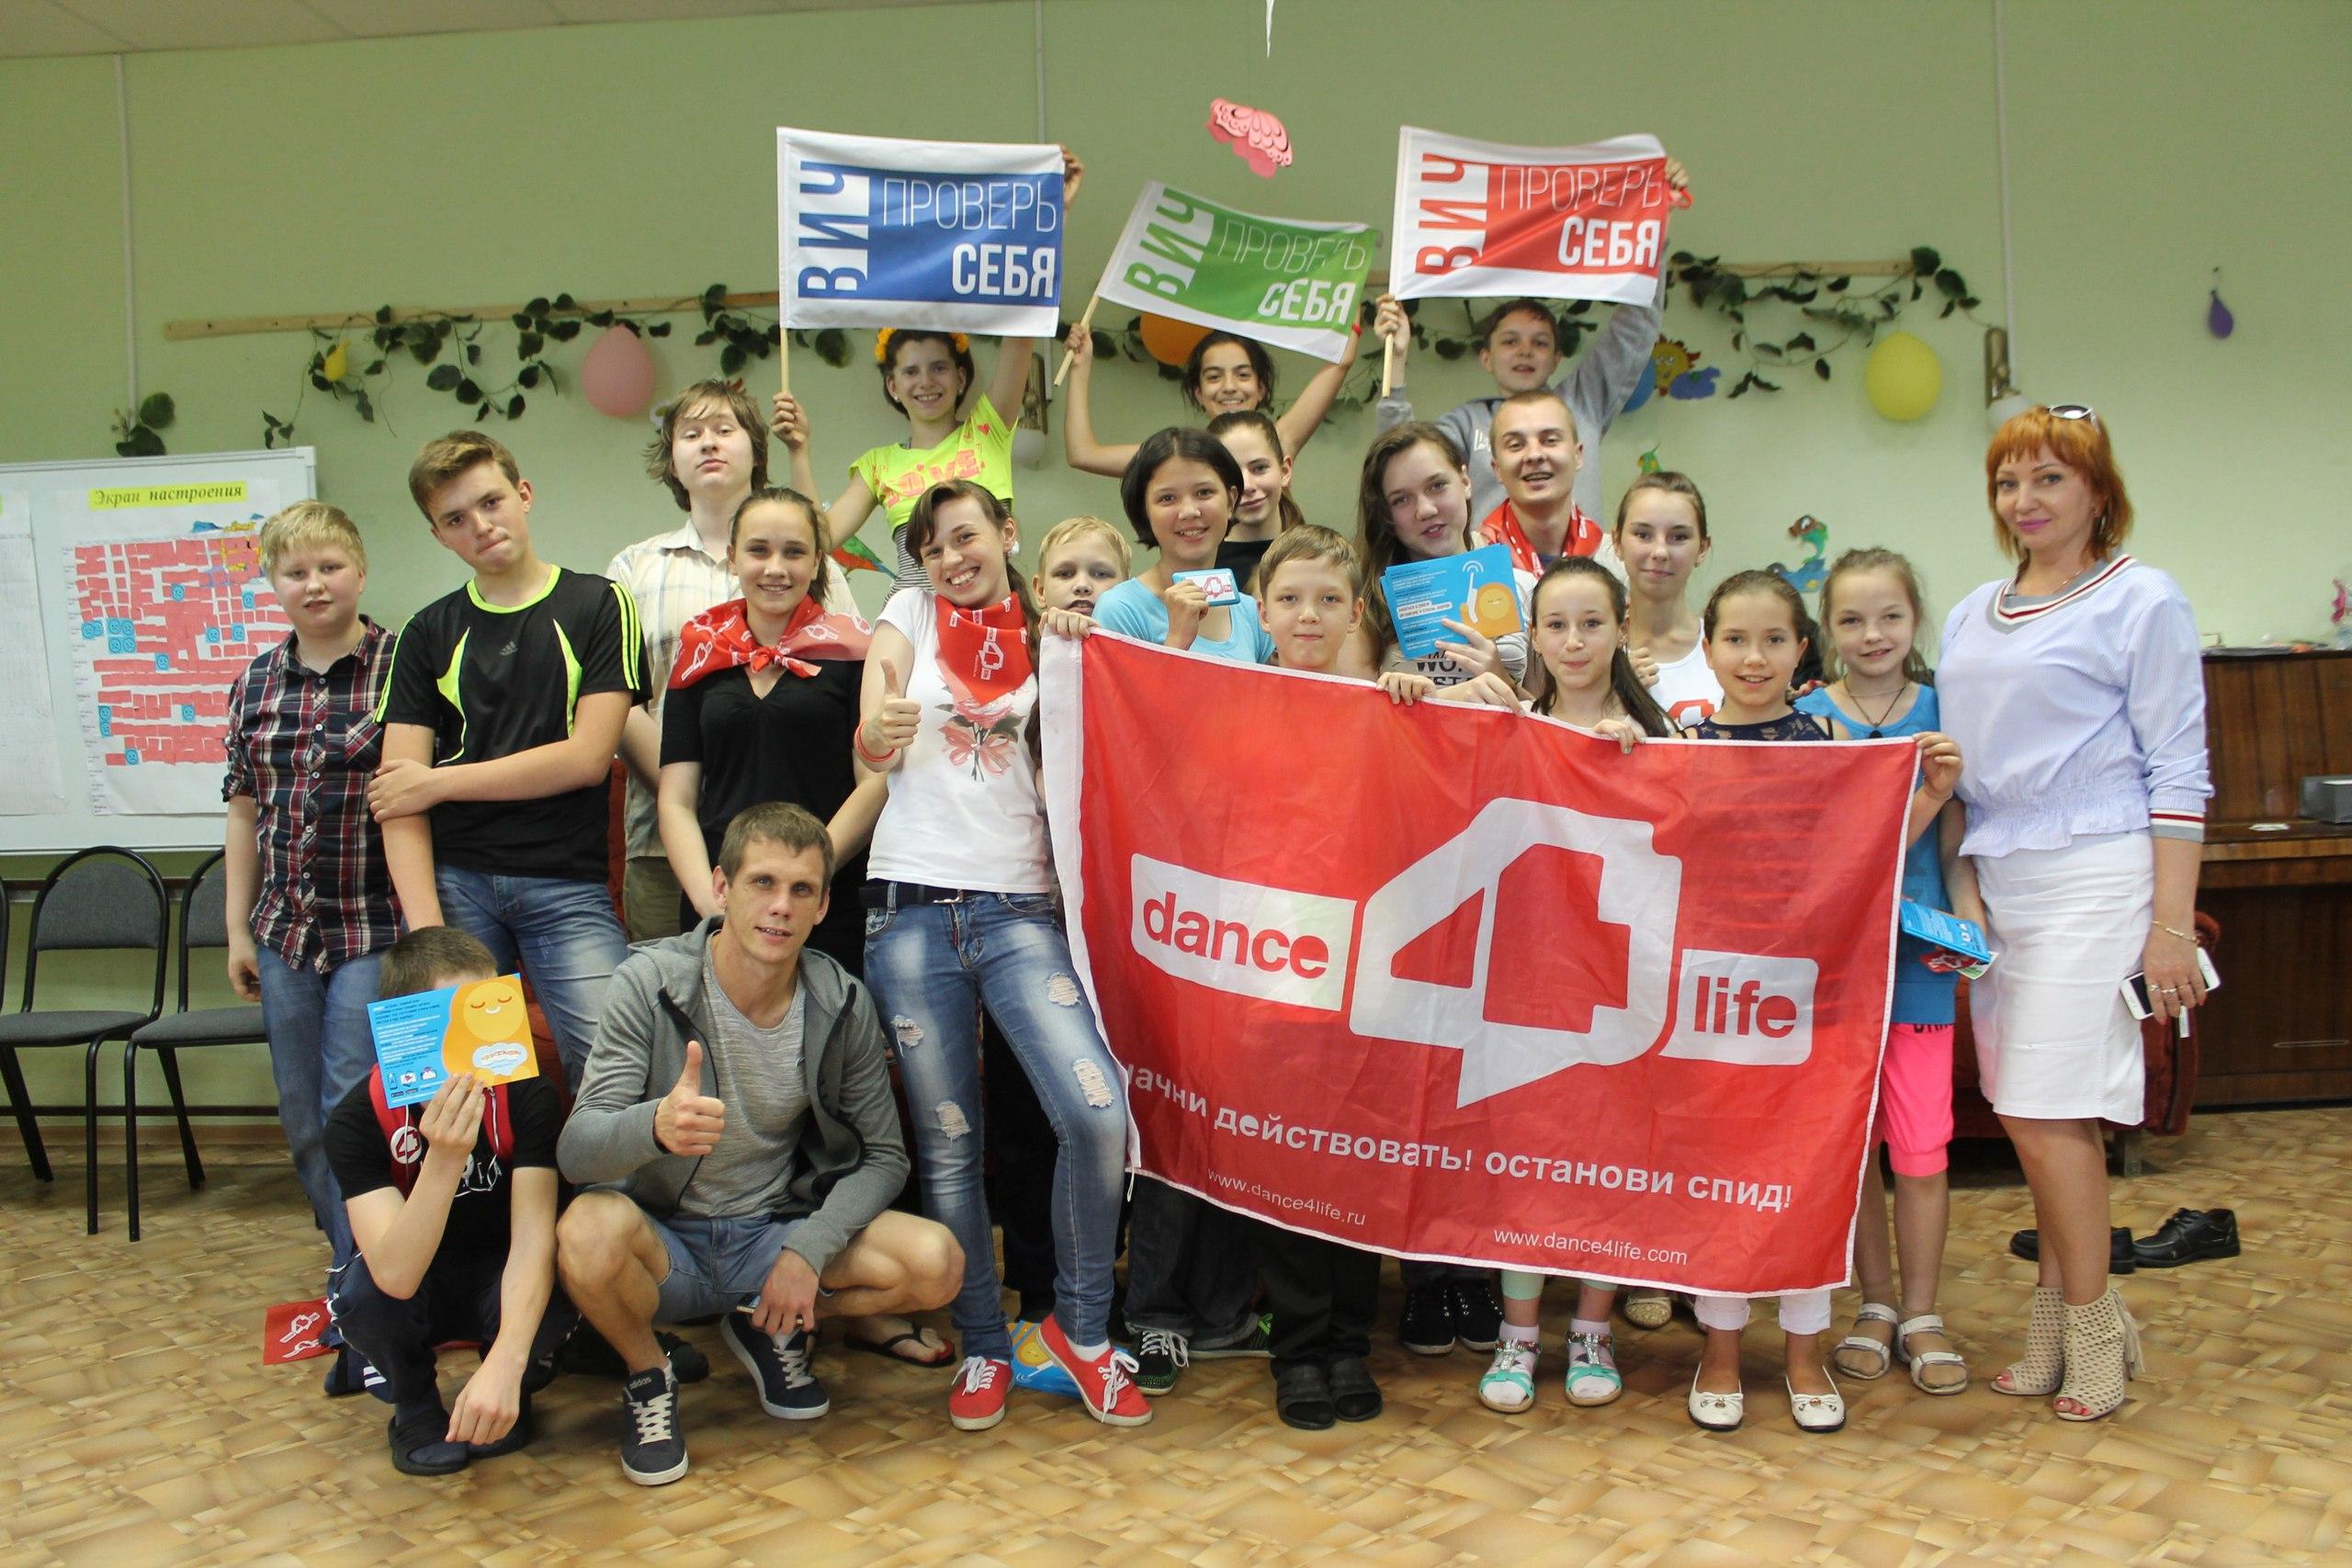 Мероприятия против молодежного алкоголизма лечение алкоголизма в калининграде центр дар